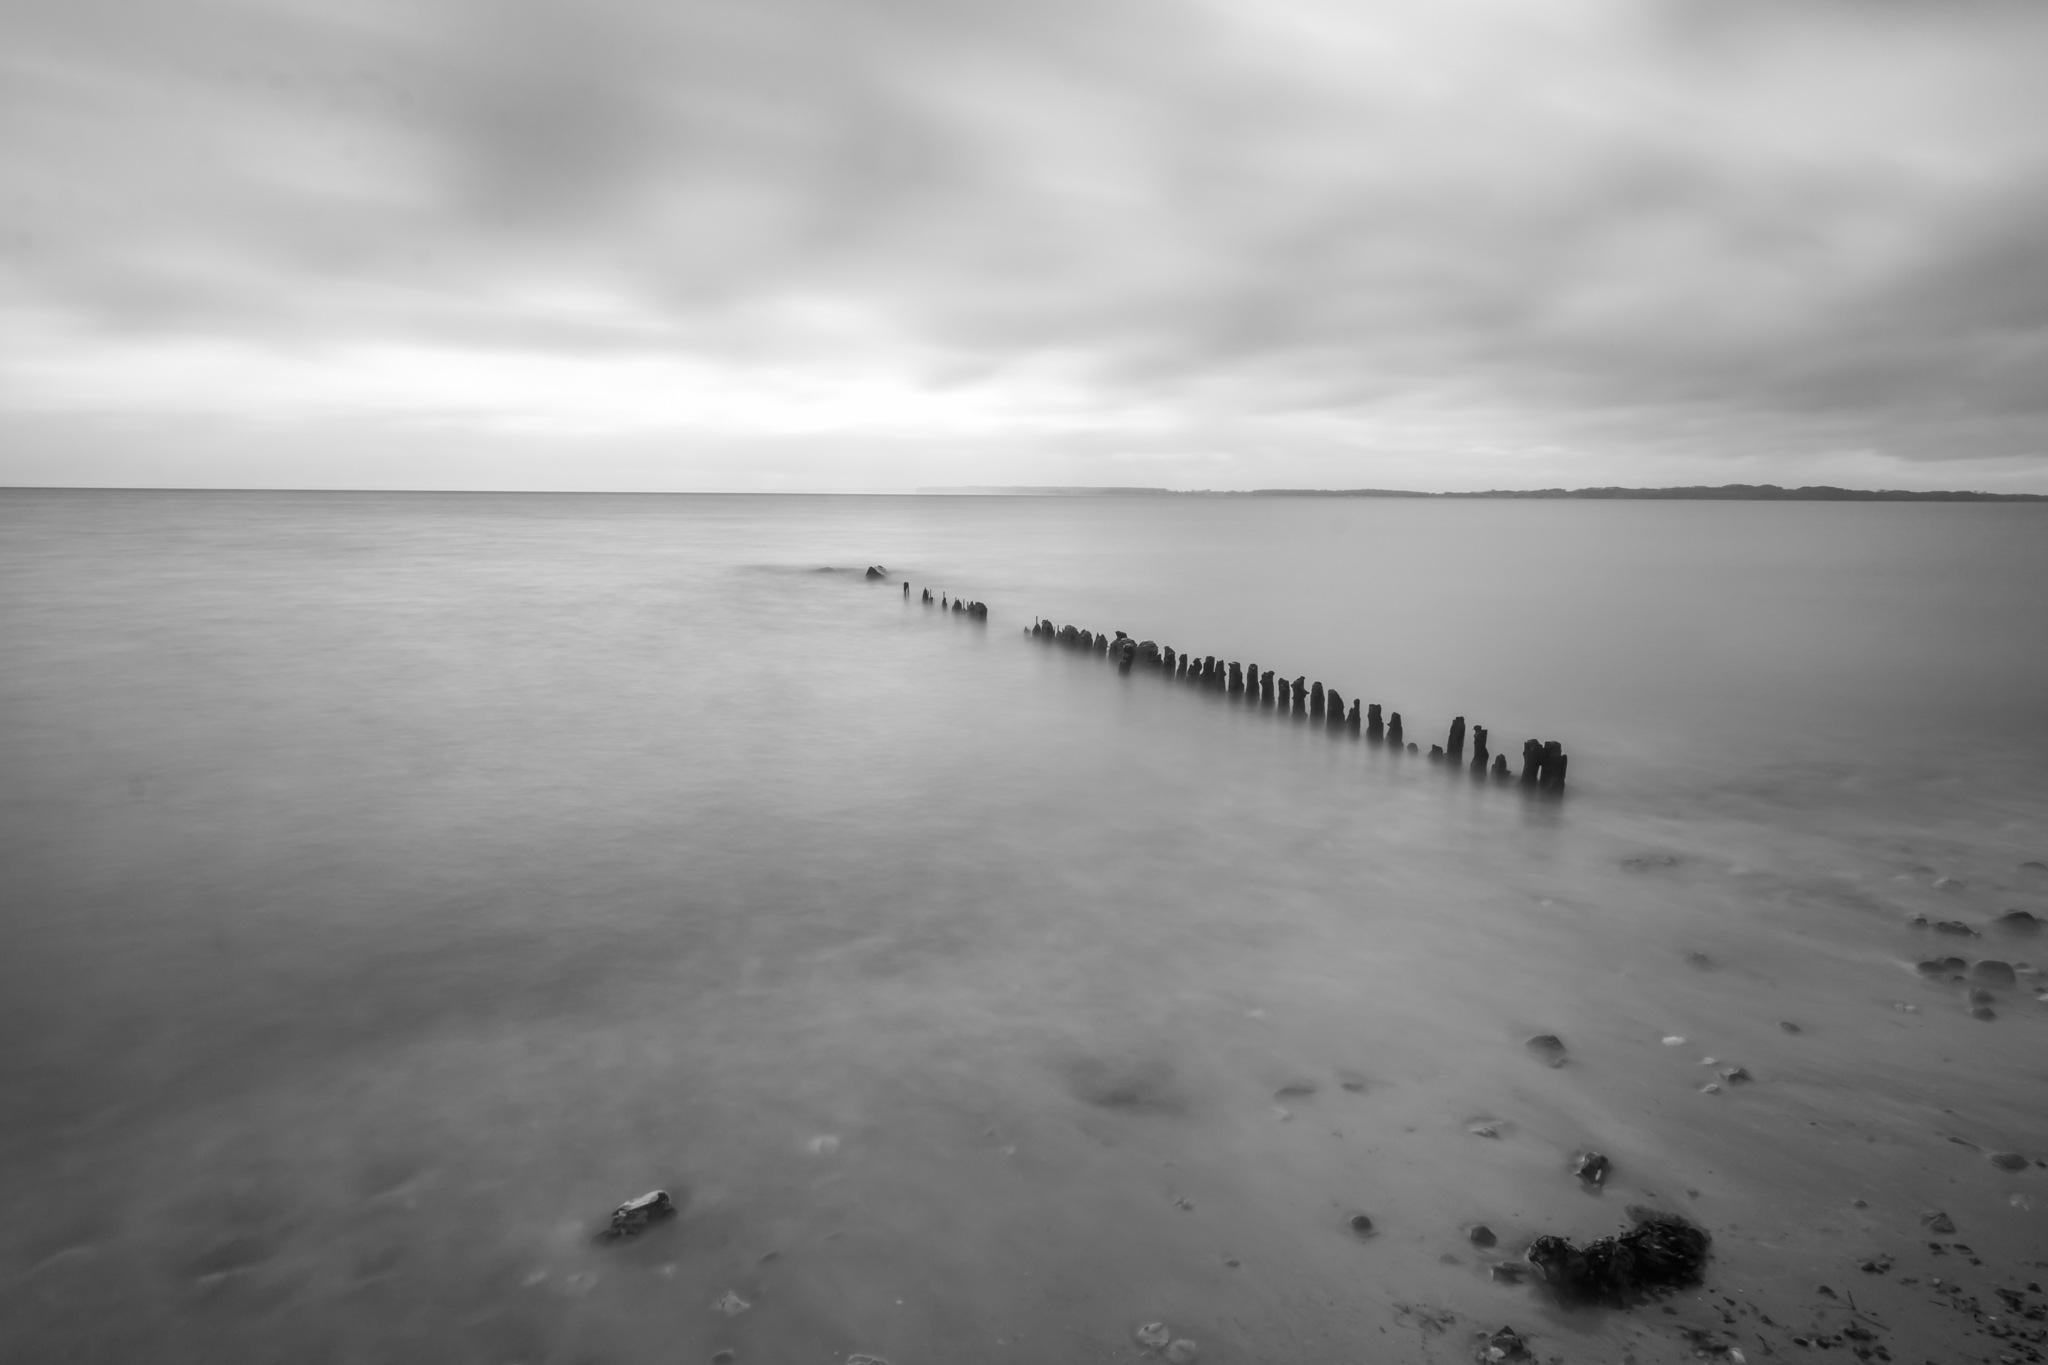 The sound of silence by Kjeld Jensen